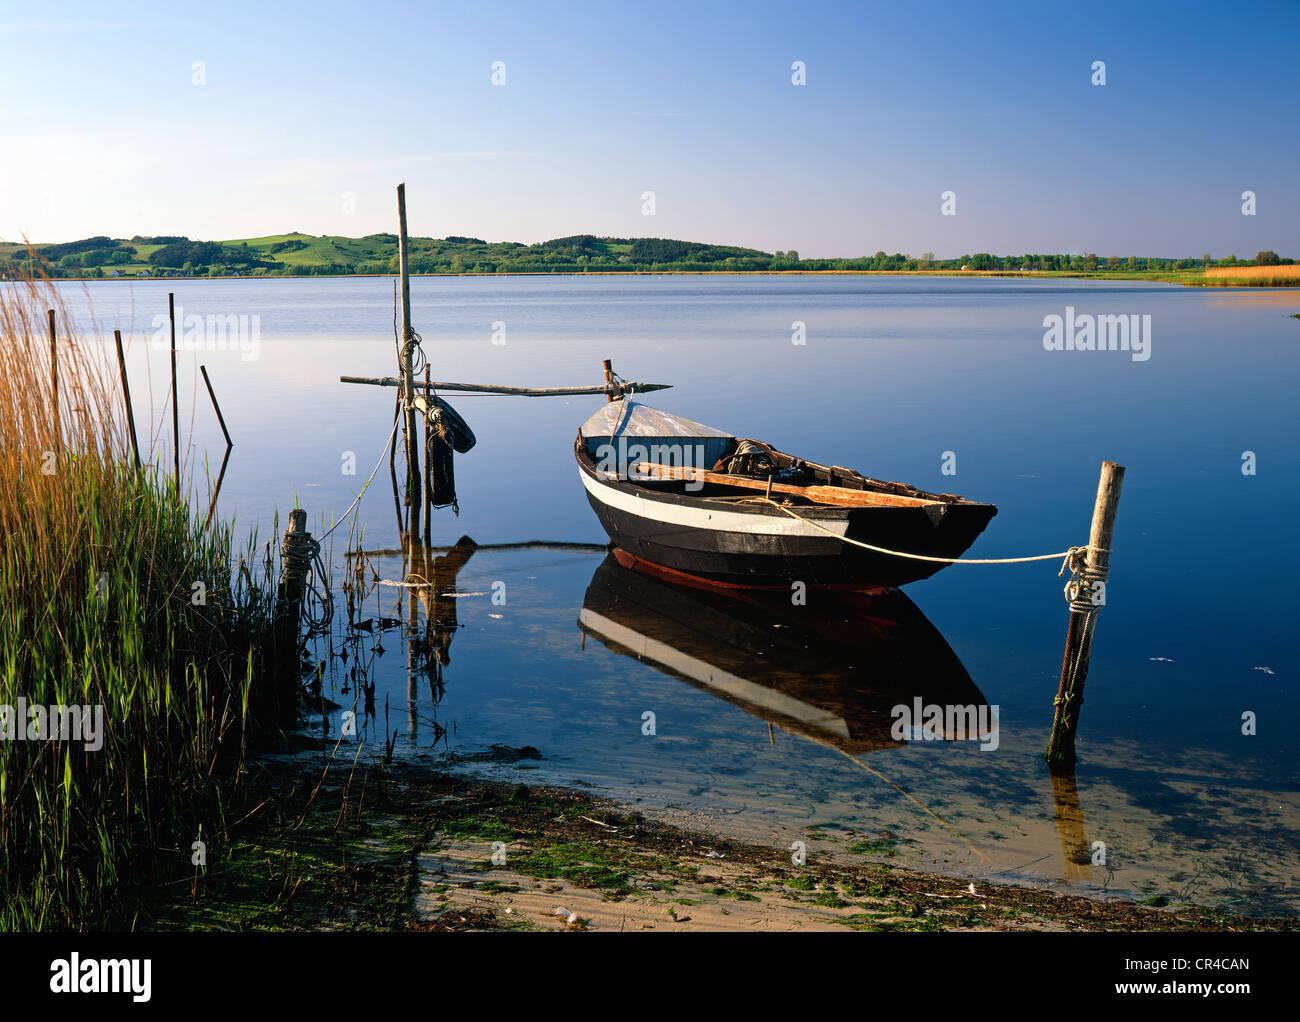 Bodden, brackish body of water, Ruegen, Mecklenburg-Western Pomerania, Germany, Europe - Stock Image